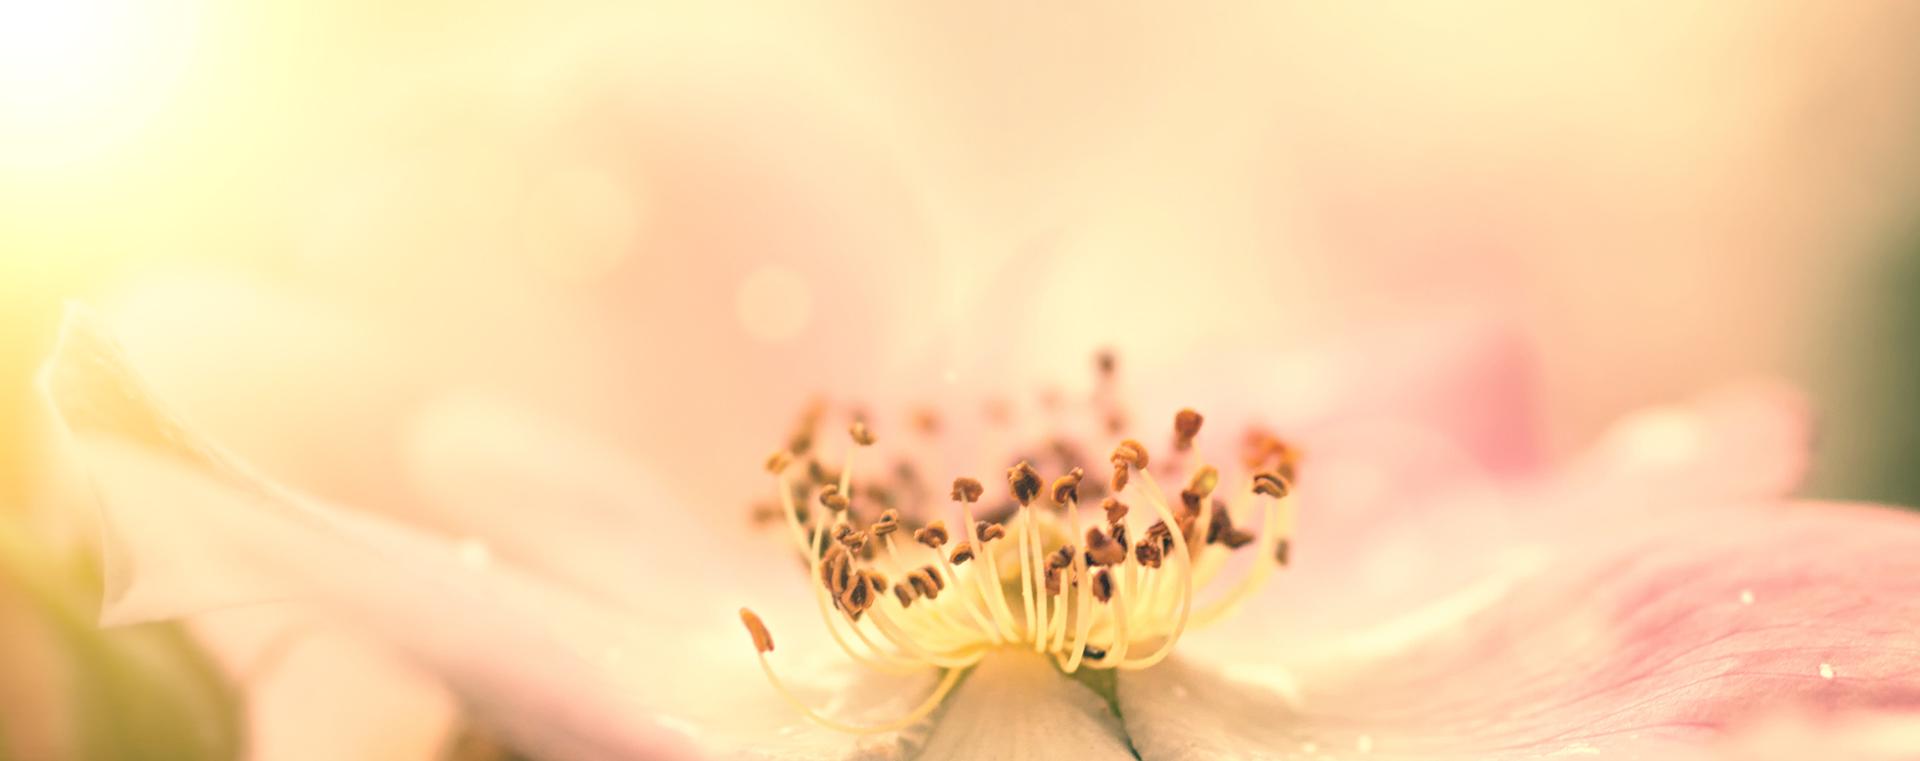 bachbluete-No-37-wild-rose-hundsrose